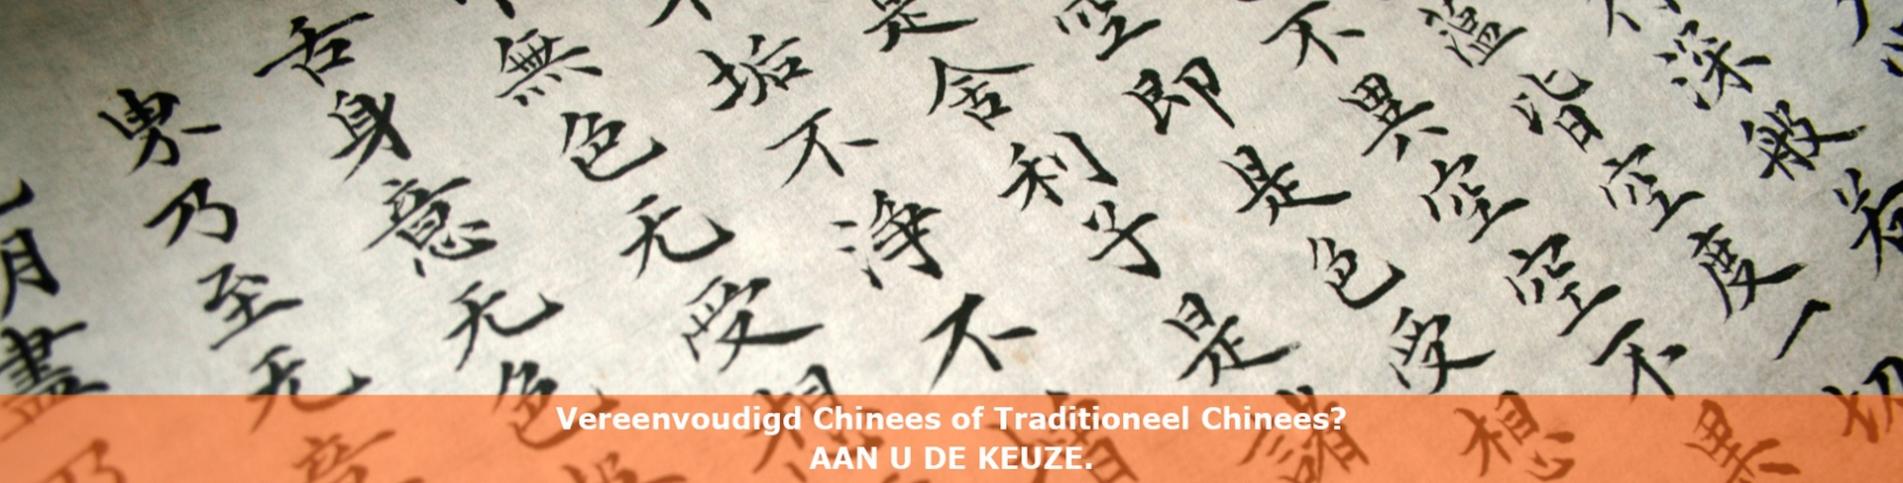 Chinese taal leren les lessen cursus chinees Baarn Eemnes Laren Blaricum Hilversum Spakenburg